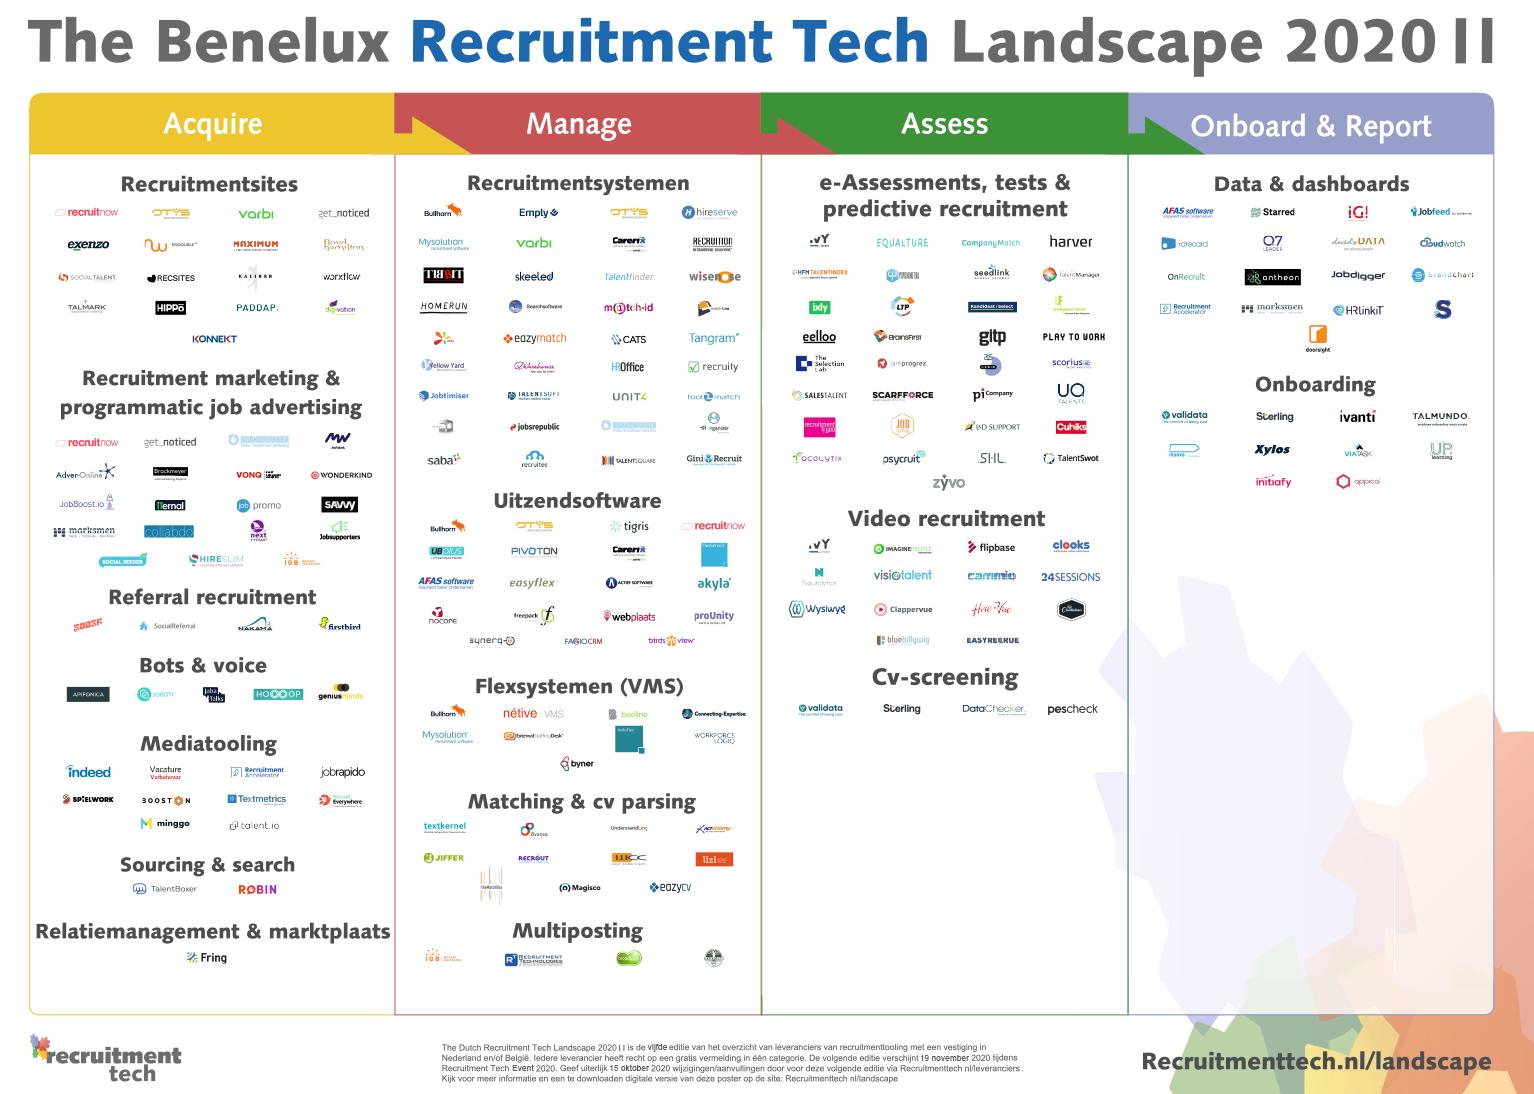 Benelux Recruitment Tech Landscape 2020 II Large